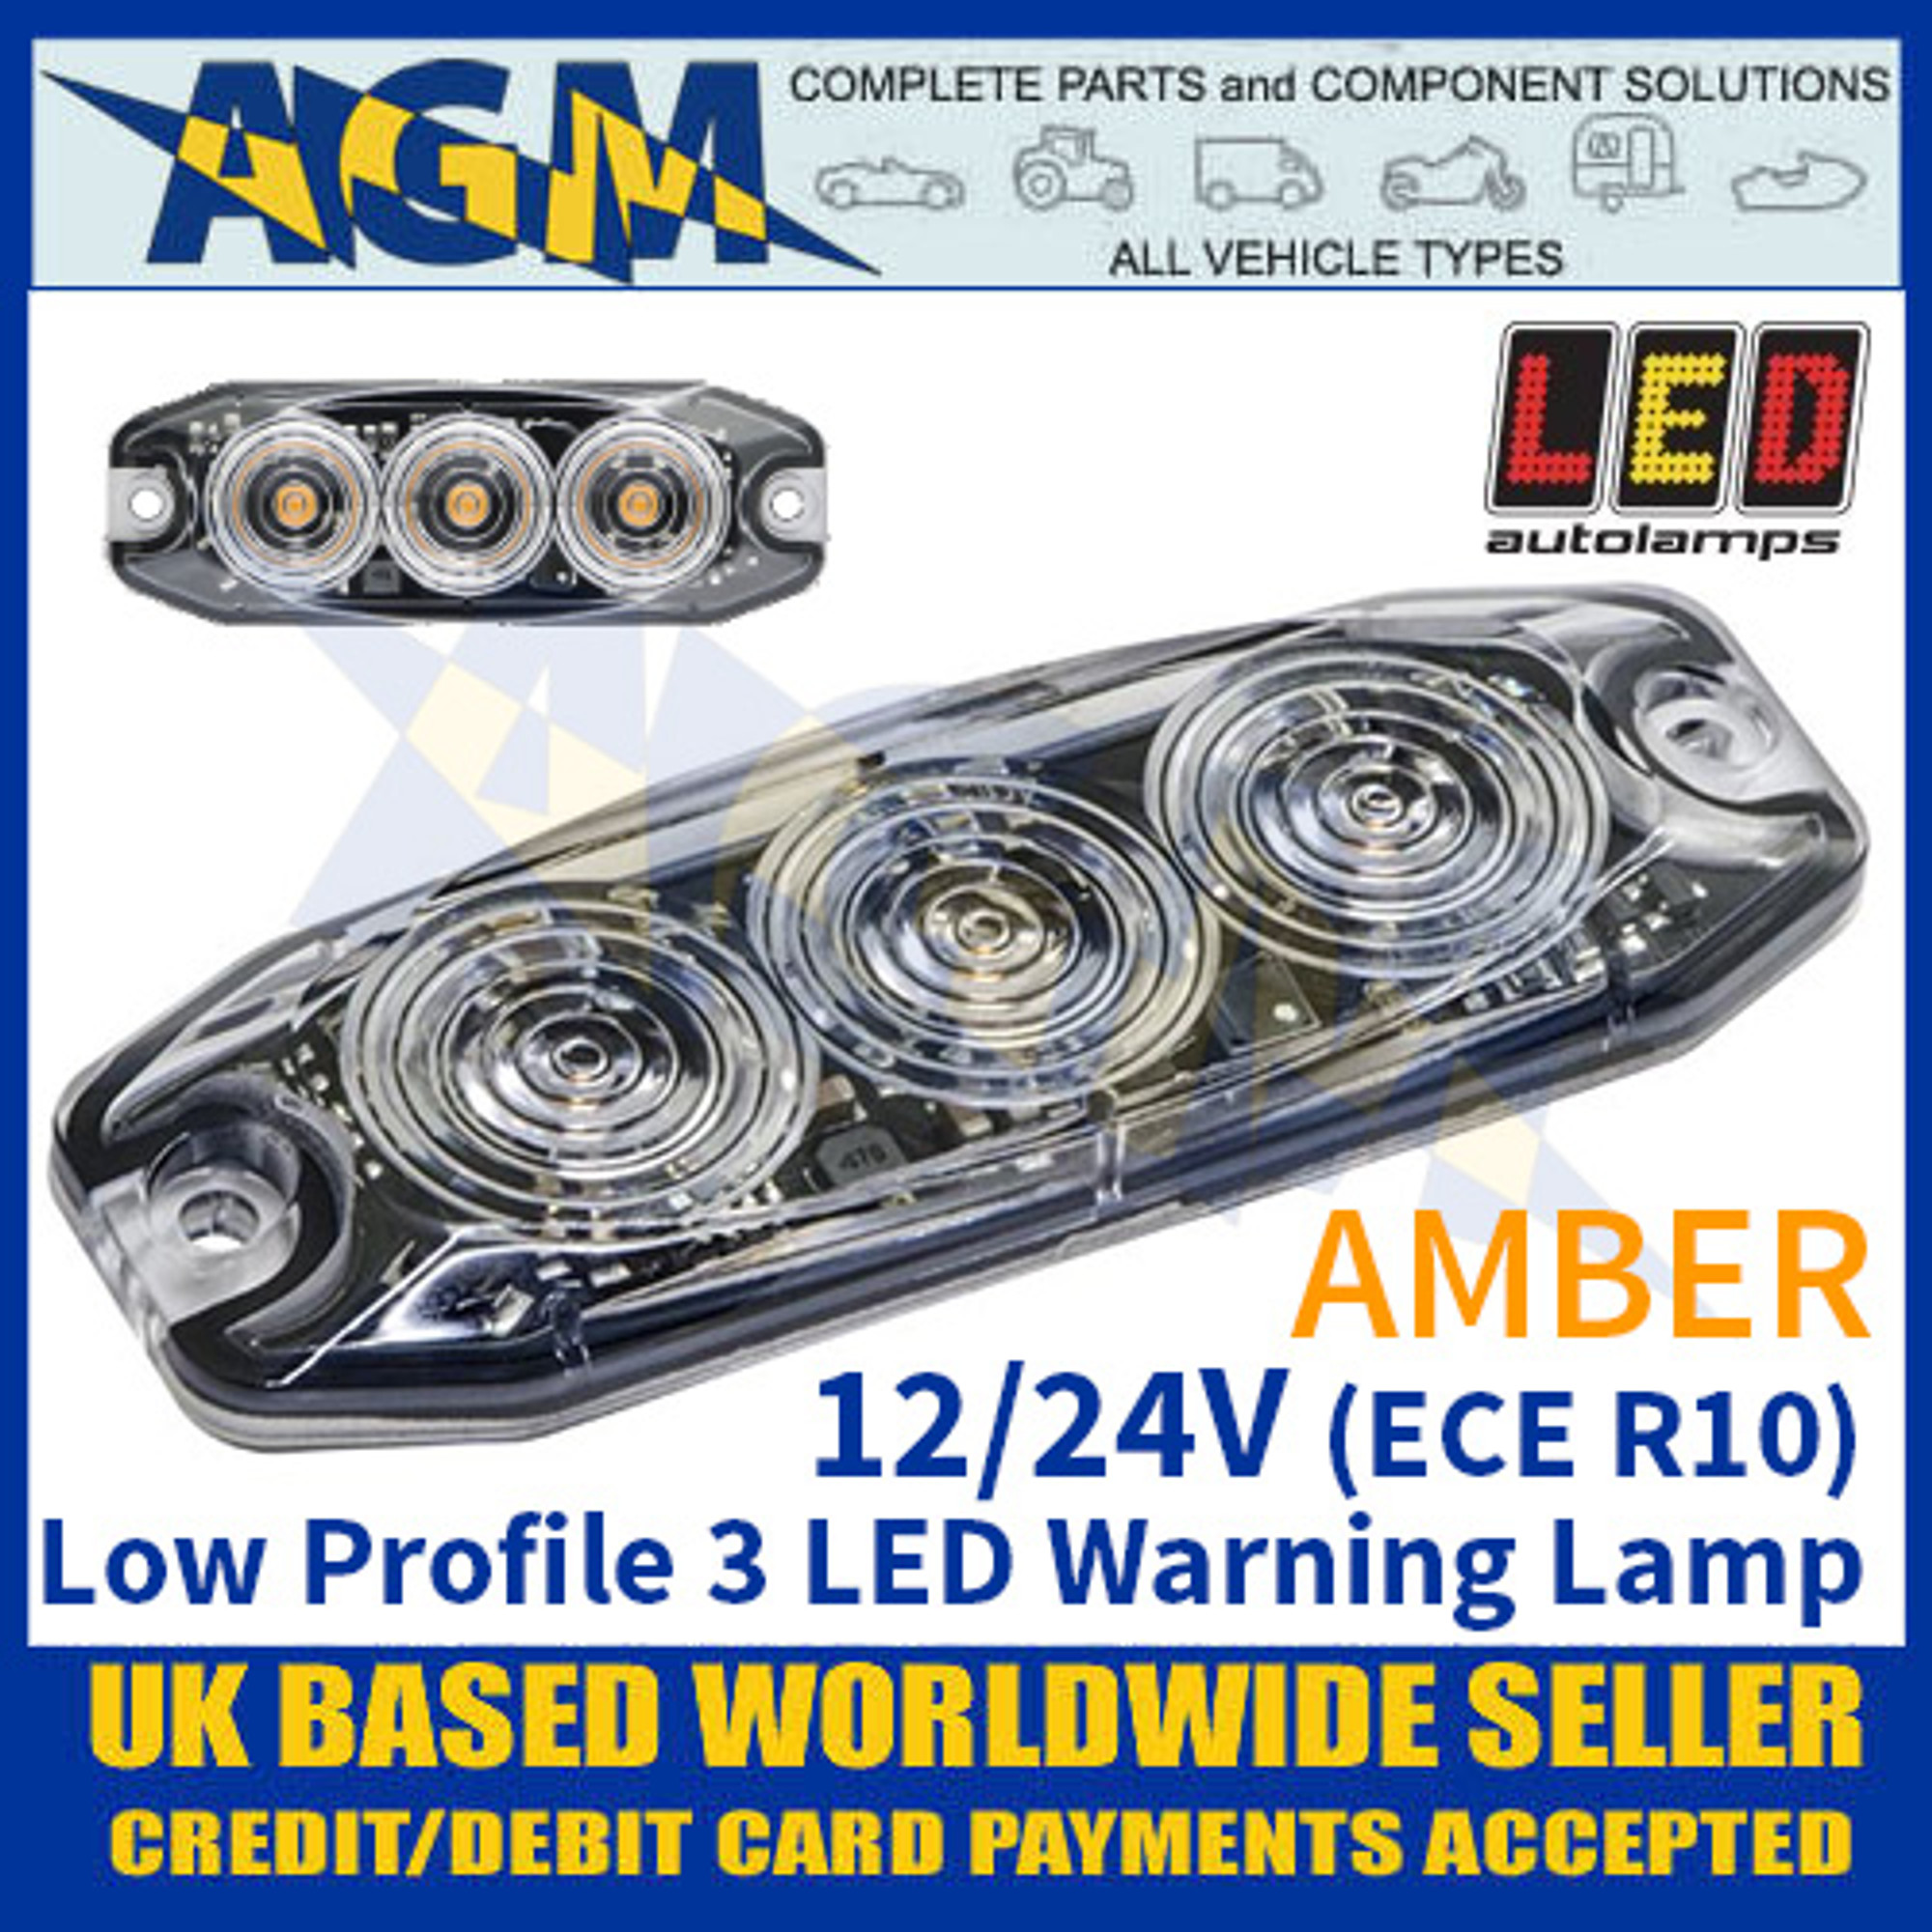 Amber 12//24V LED Autolamps LPR103DVA Low Profile 3-LED Warning Lamp